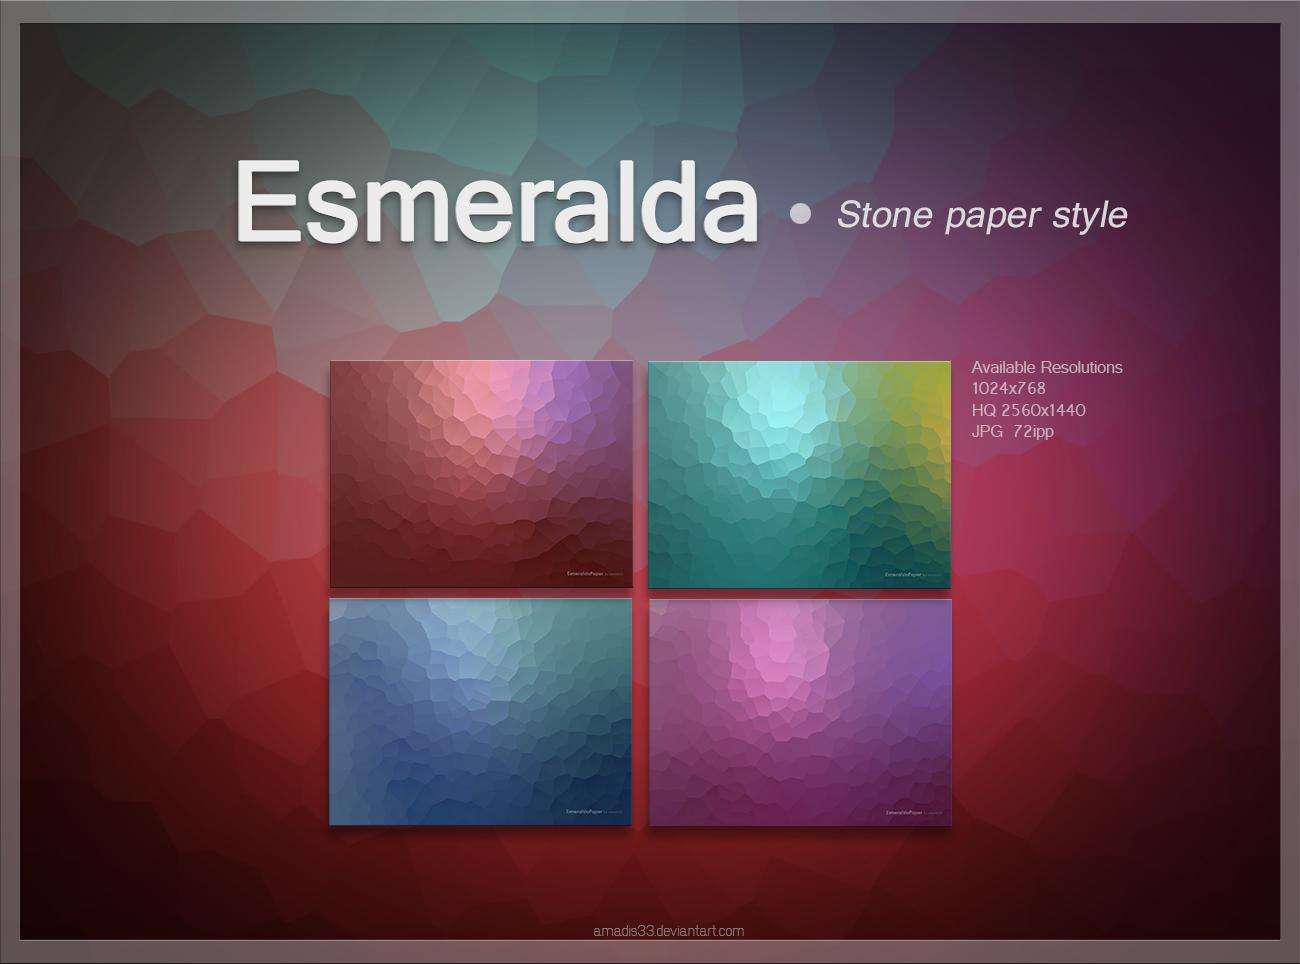 Esmeralda Stone Paper by amadis33